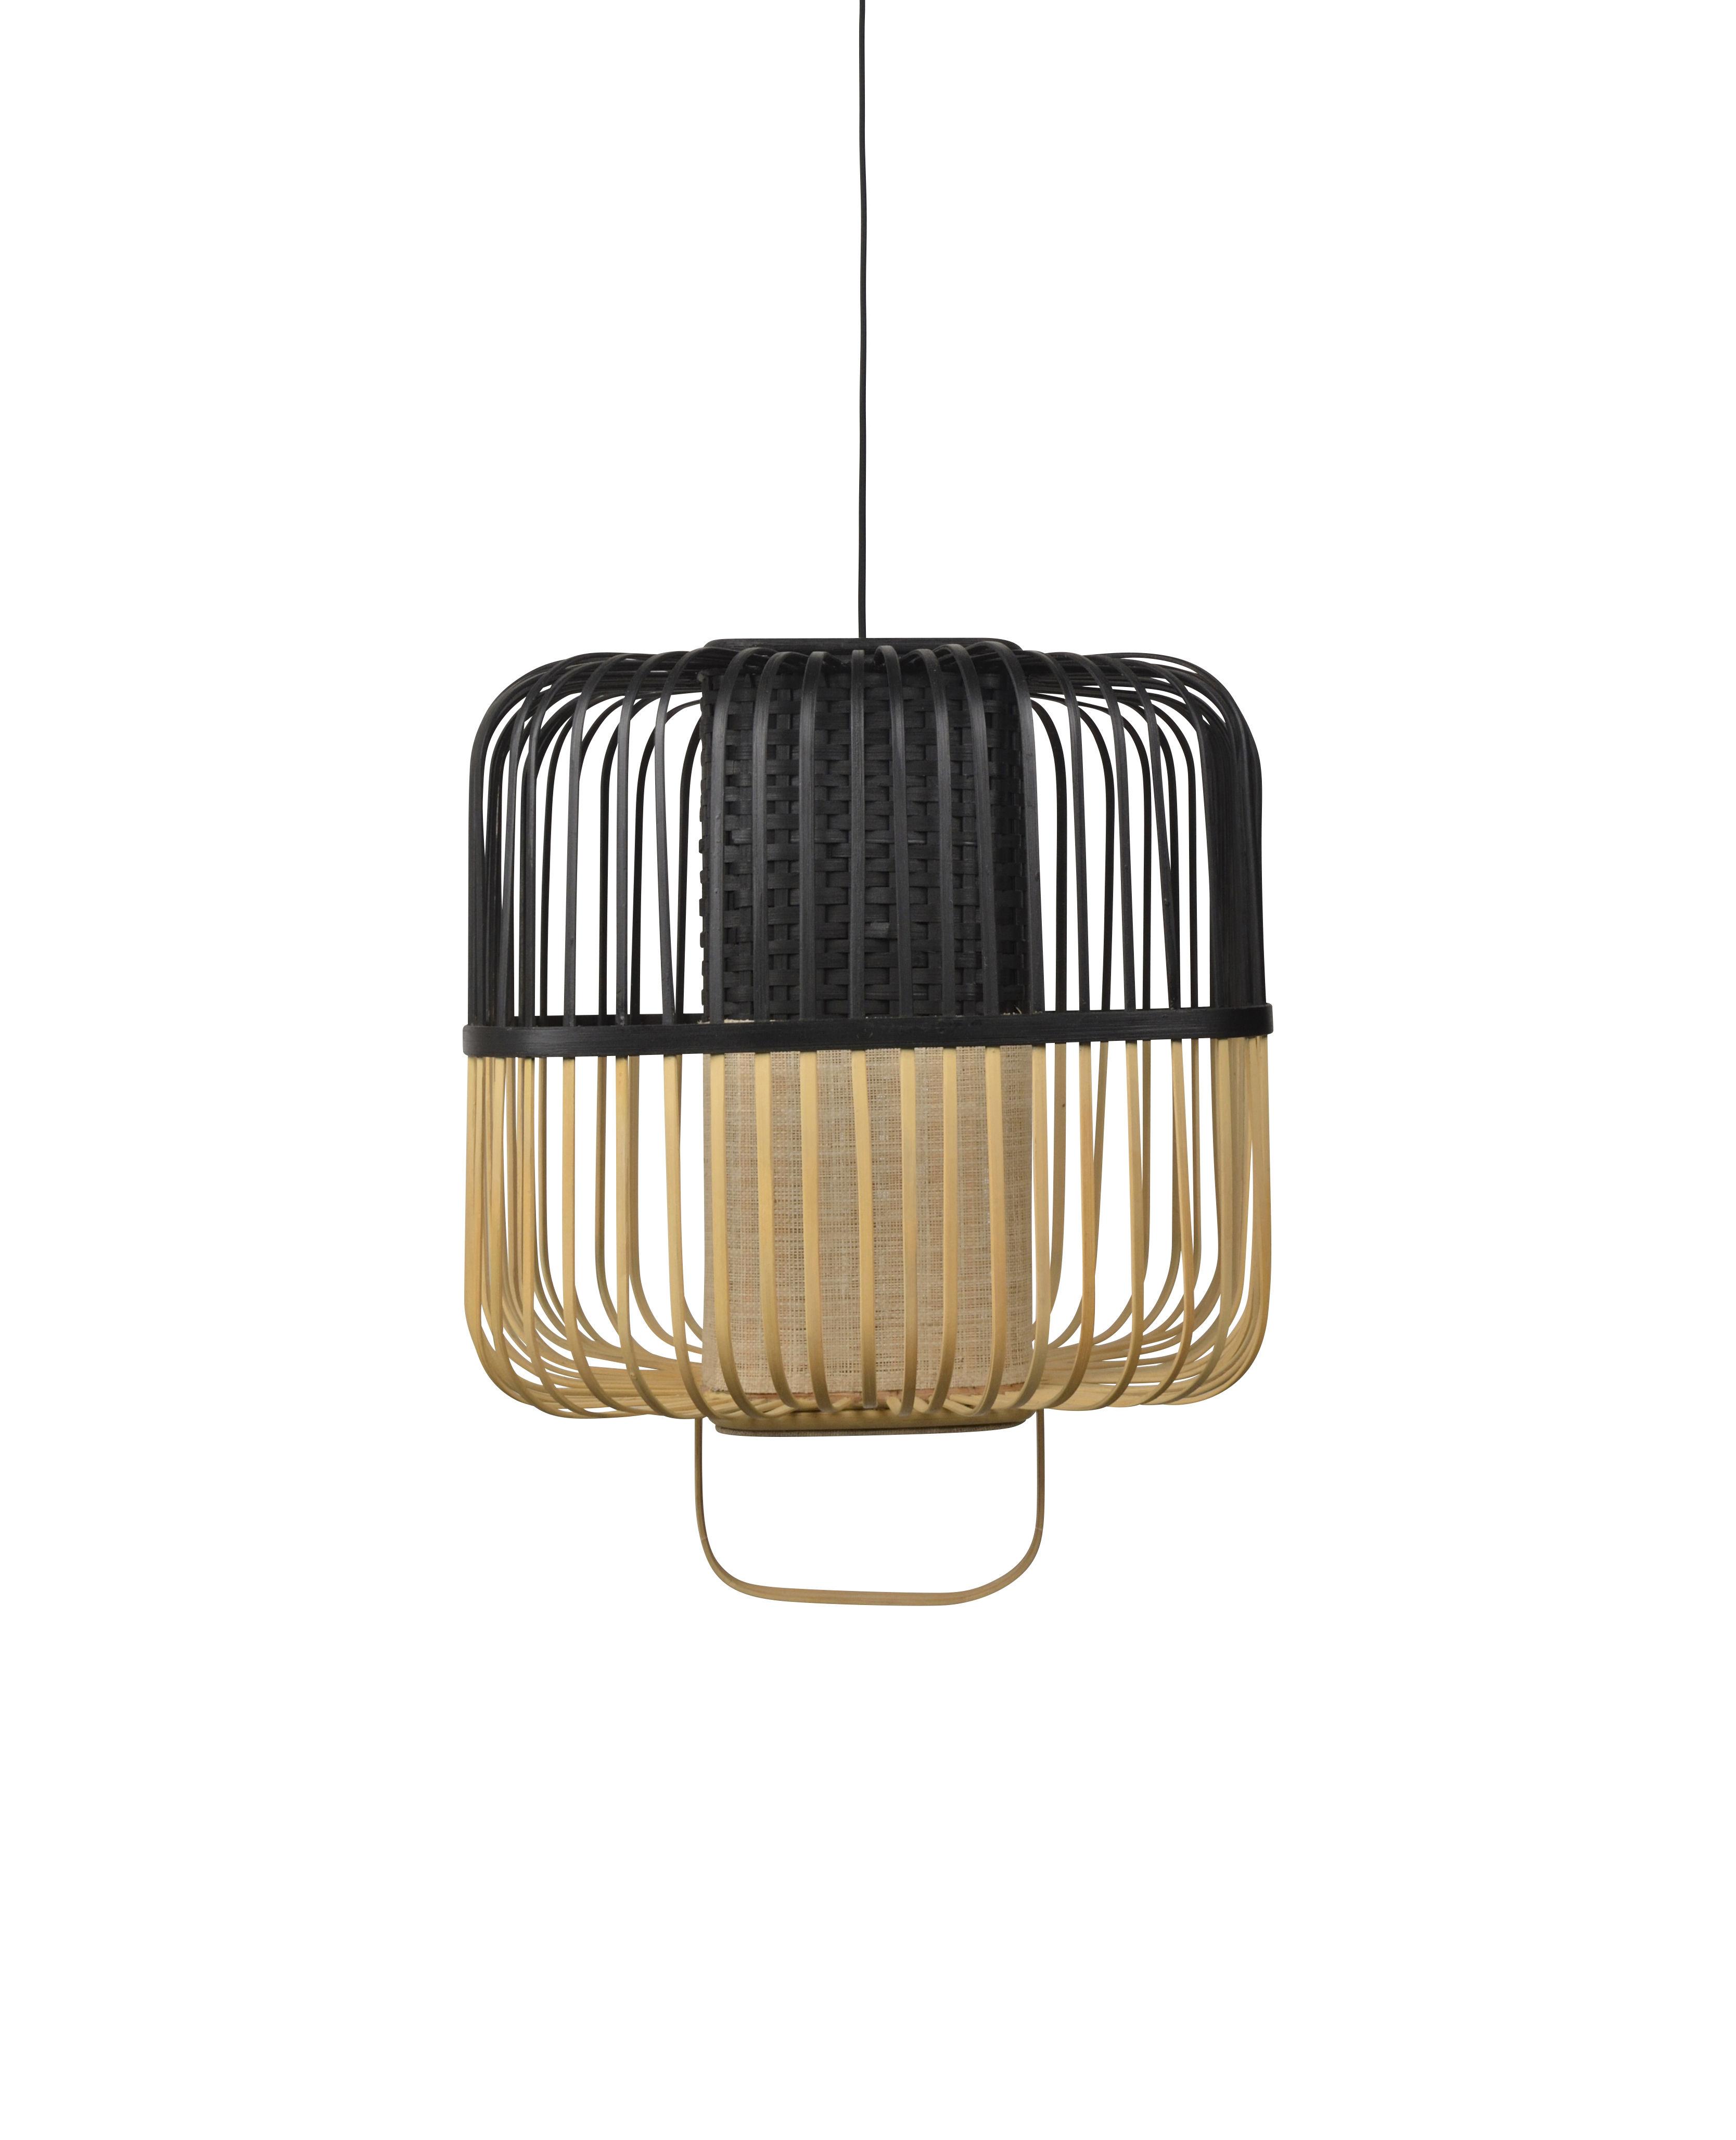 Lighting - Pendant Lighting - Bamboo Square Pendant - / Medium - H 43 cm by Forestier - Black - Bamboo